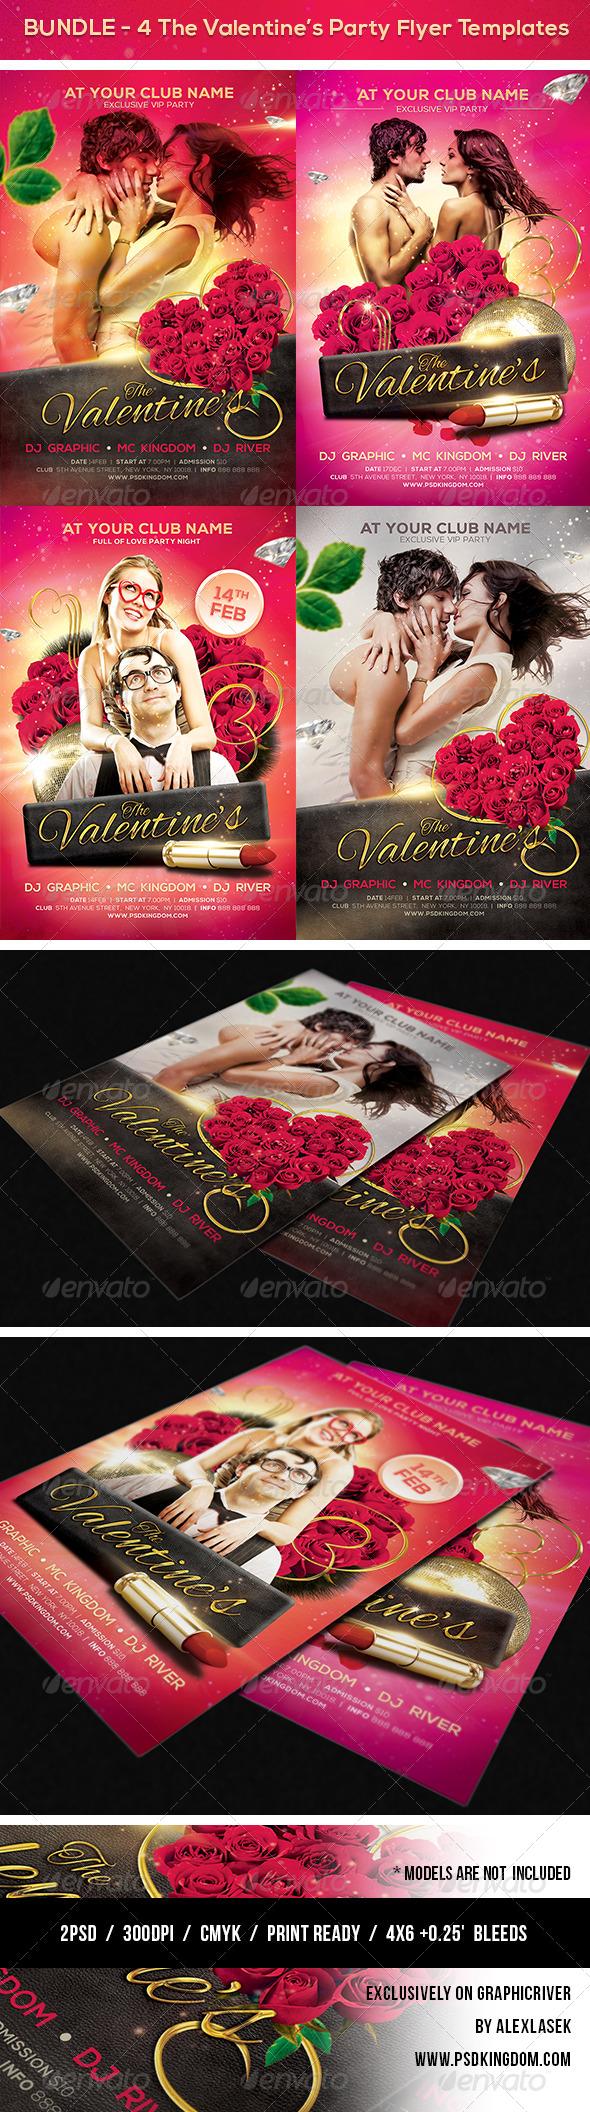 Bundle Valentine's Party Flyer Templates 4x6 - Clubs & Parties Events